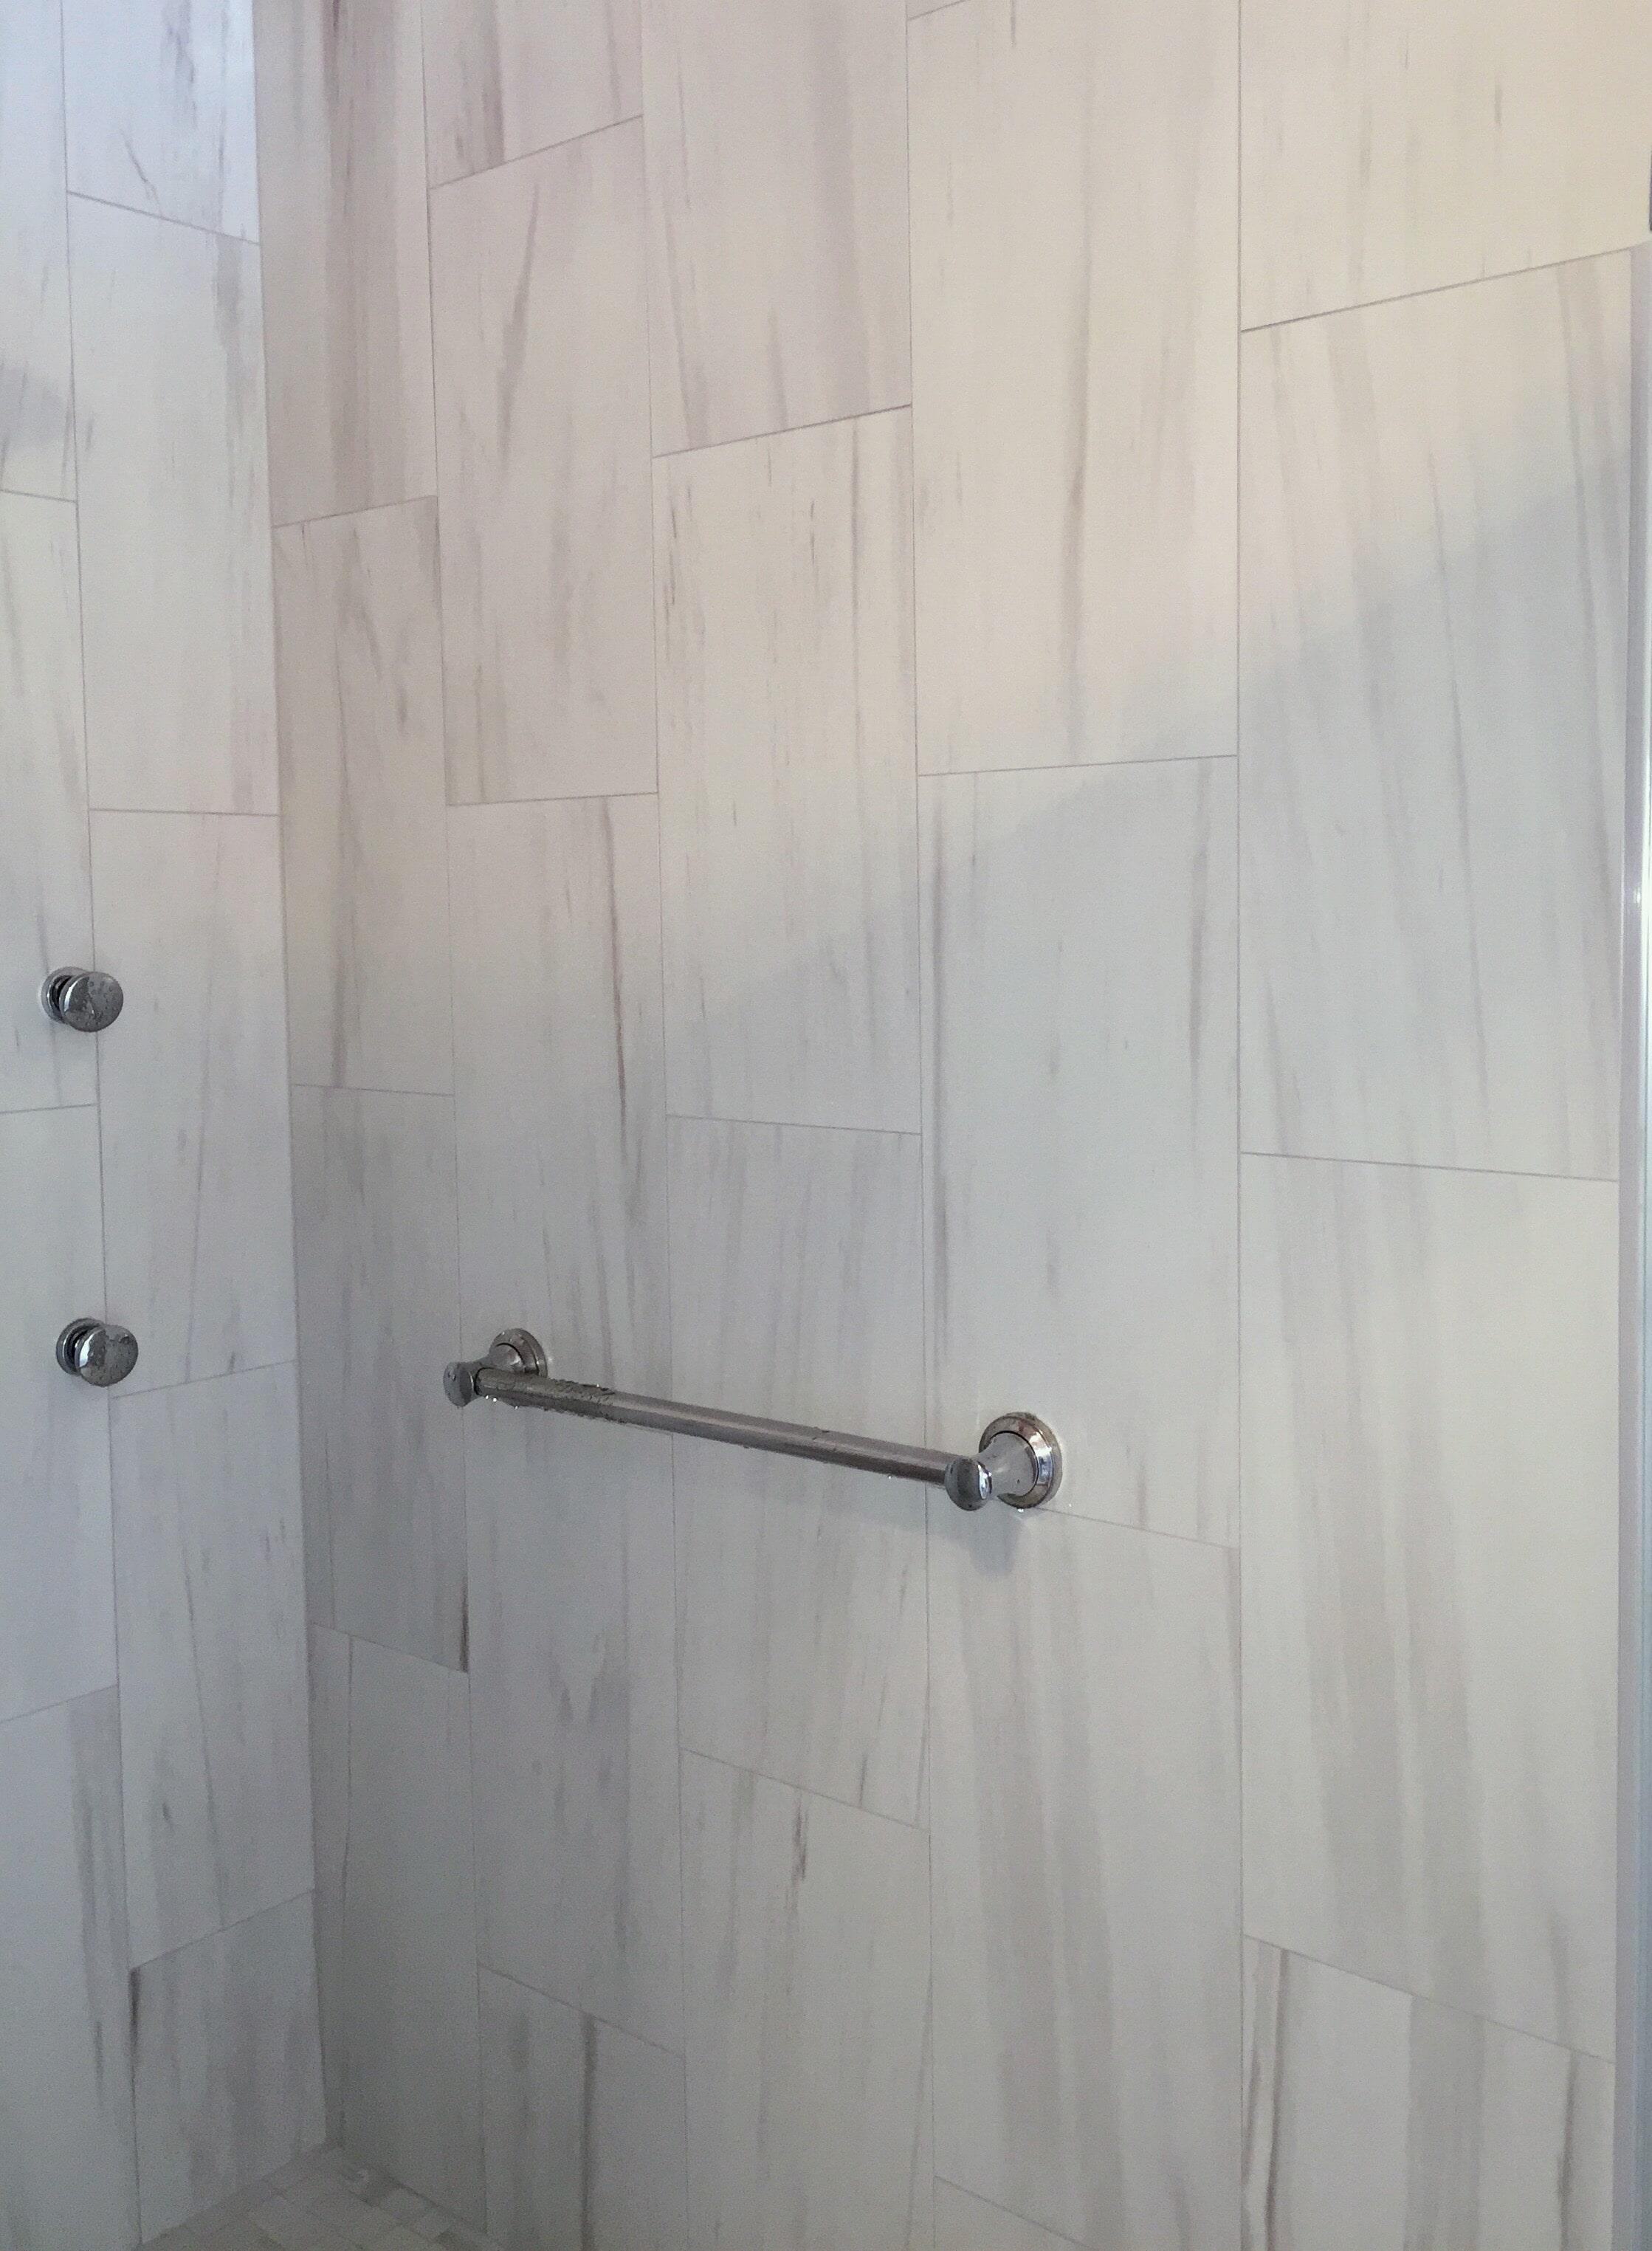 Tile shower in Wilson NC from Richie Ballance Flooring